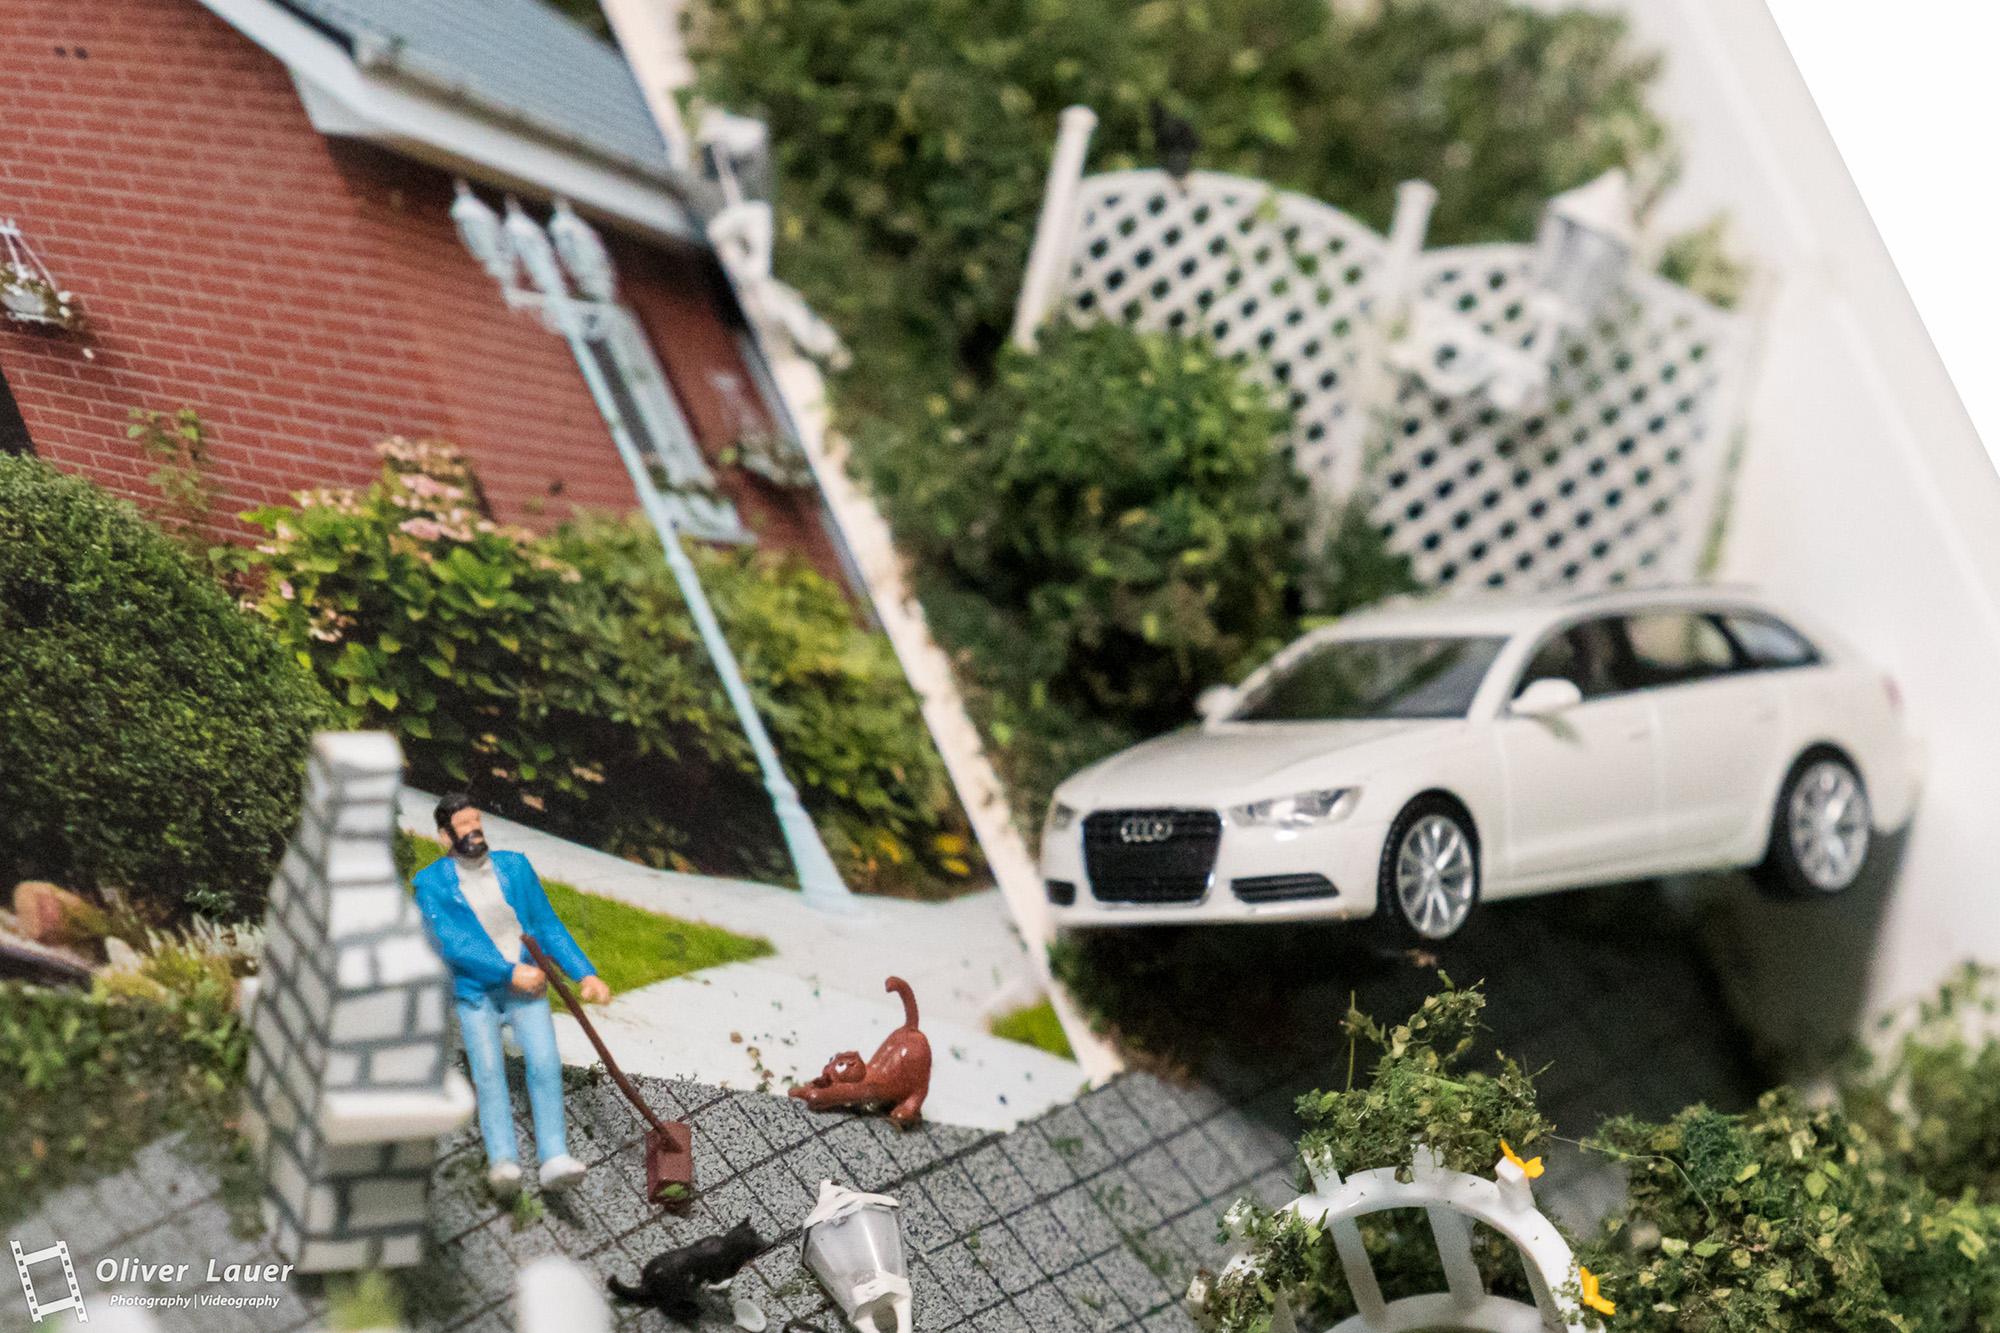 modellinghour.com - frame model - 02-02